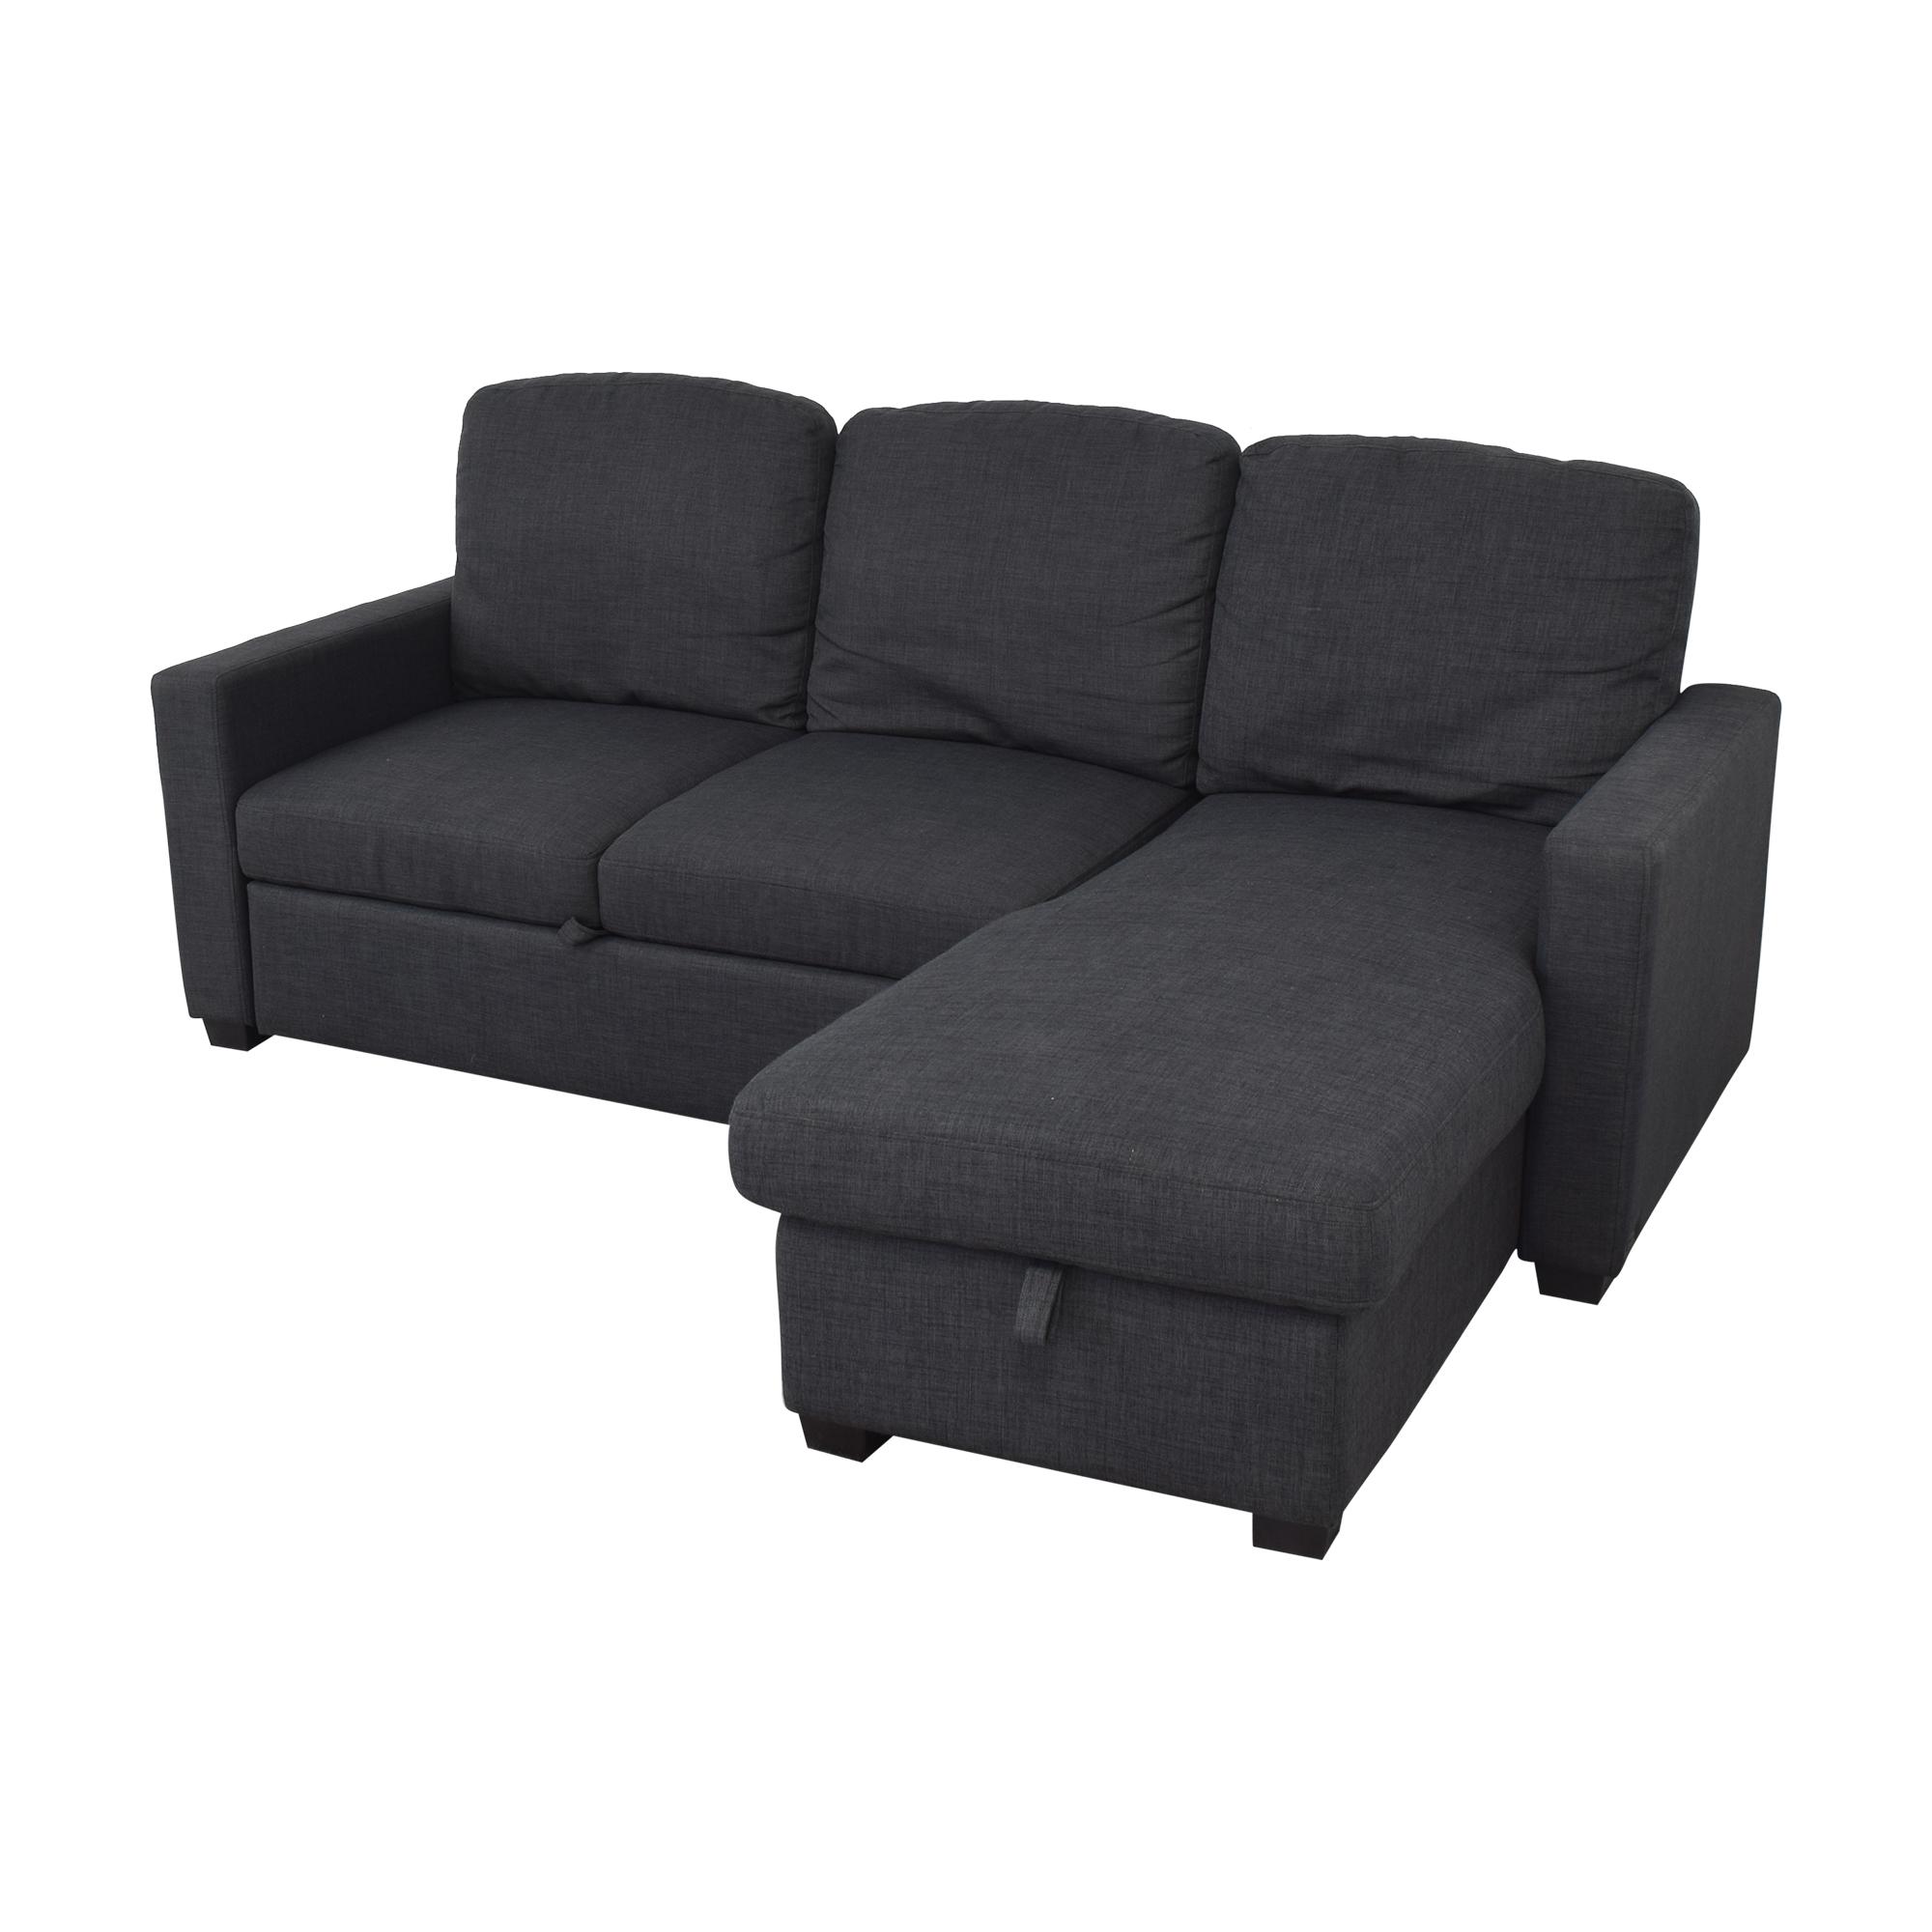 47 OFF   Target Target Newman Sleeper Sectional Sofa / Sofas